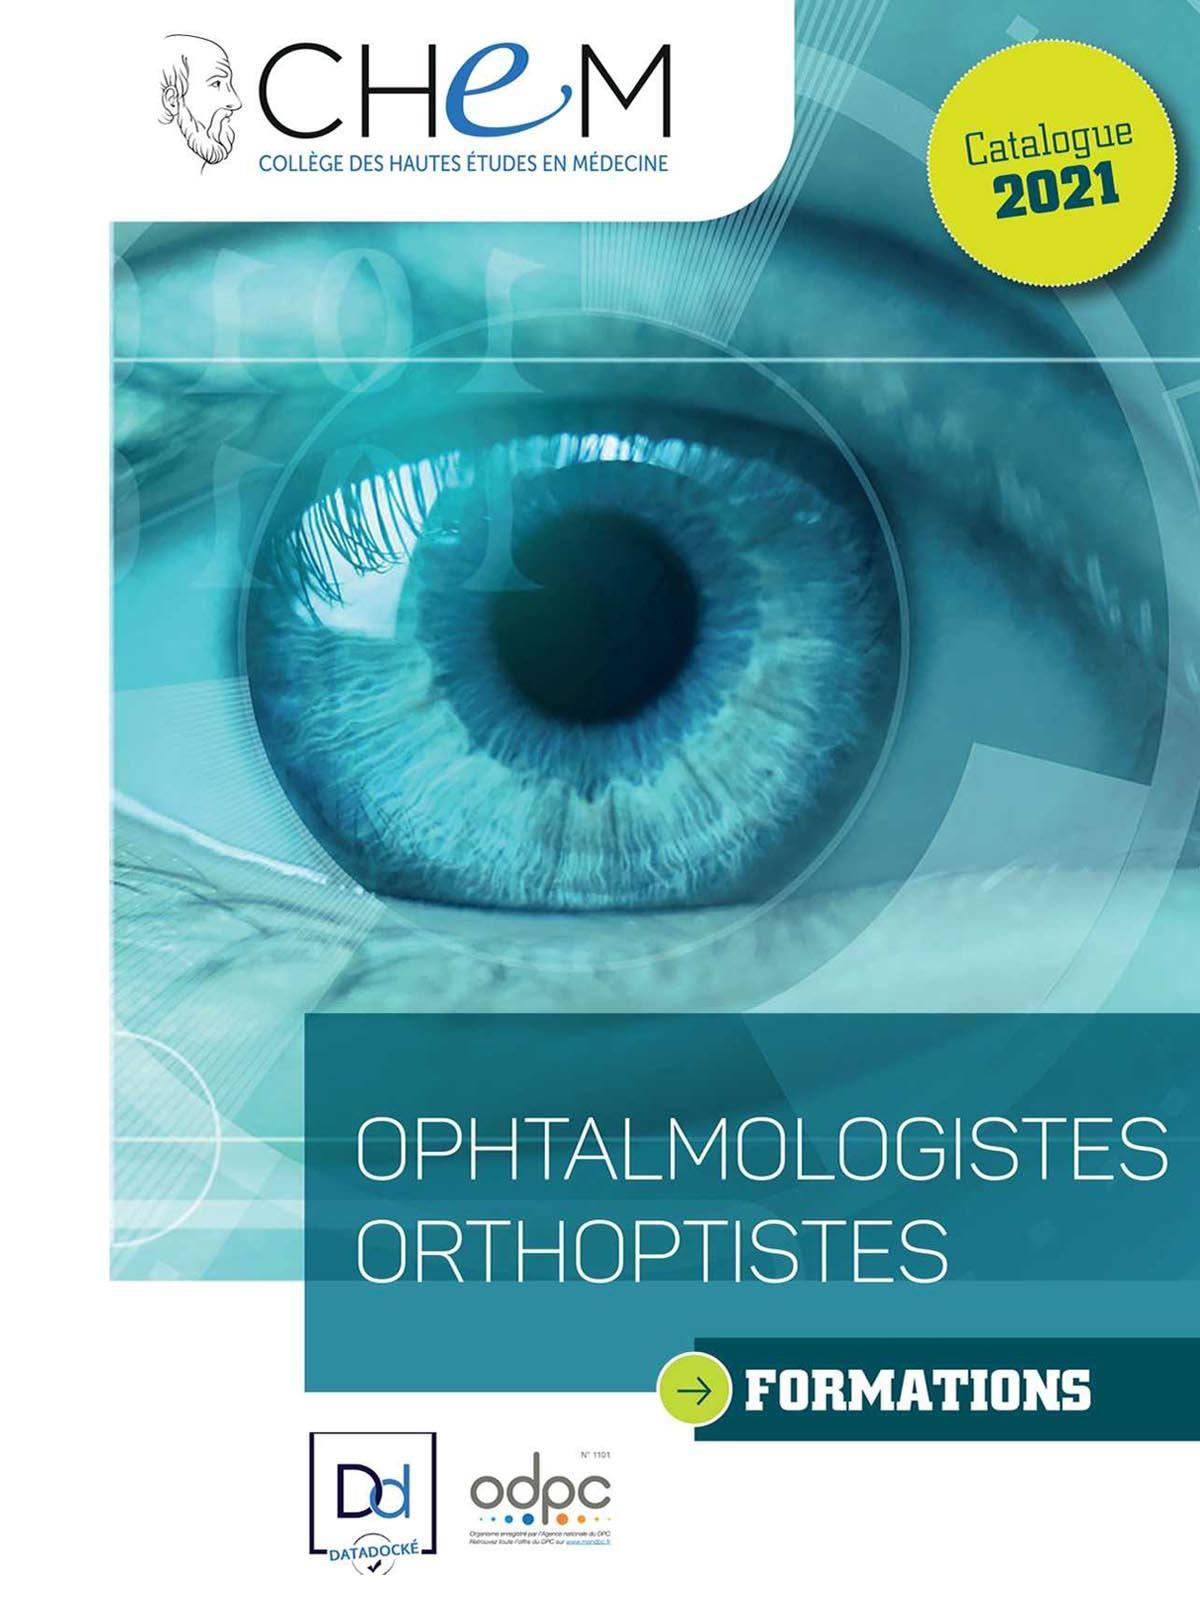 OPHTALMOLOGISTES ORTHOPTISTES